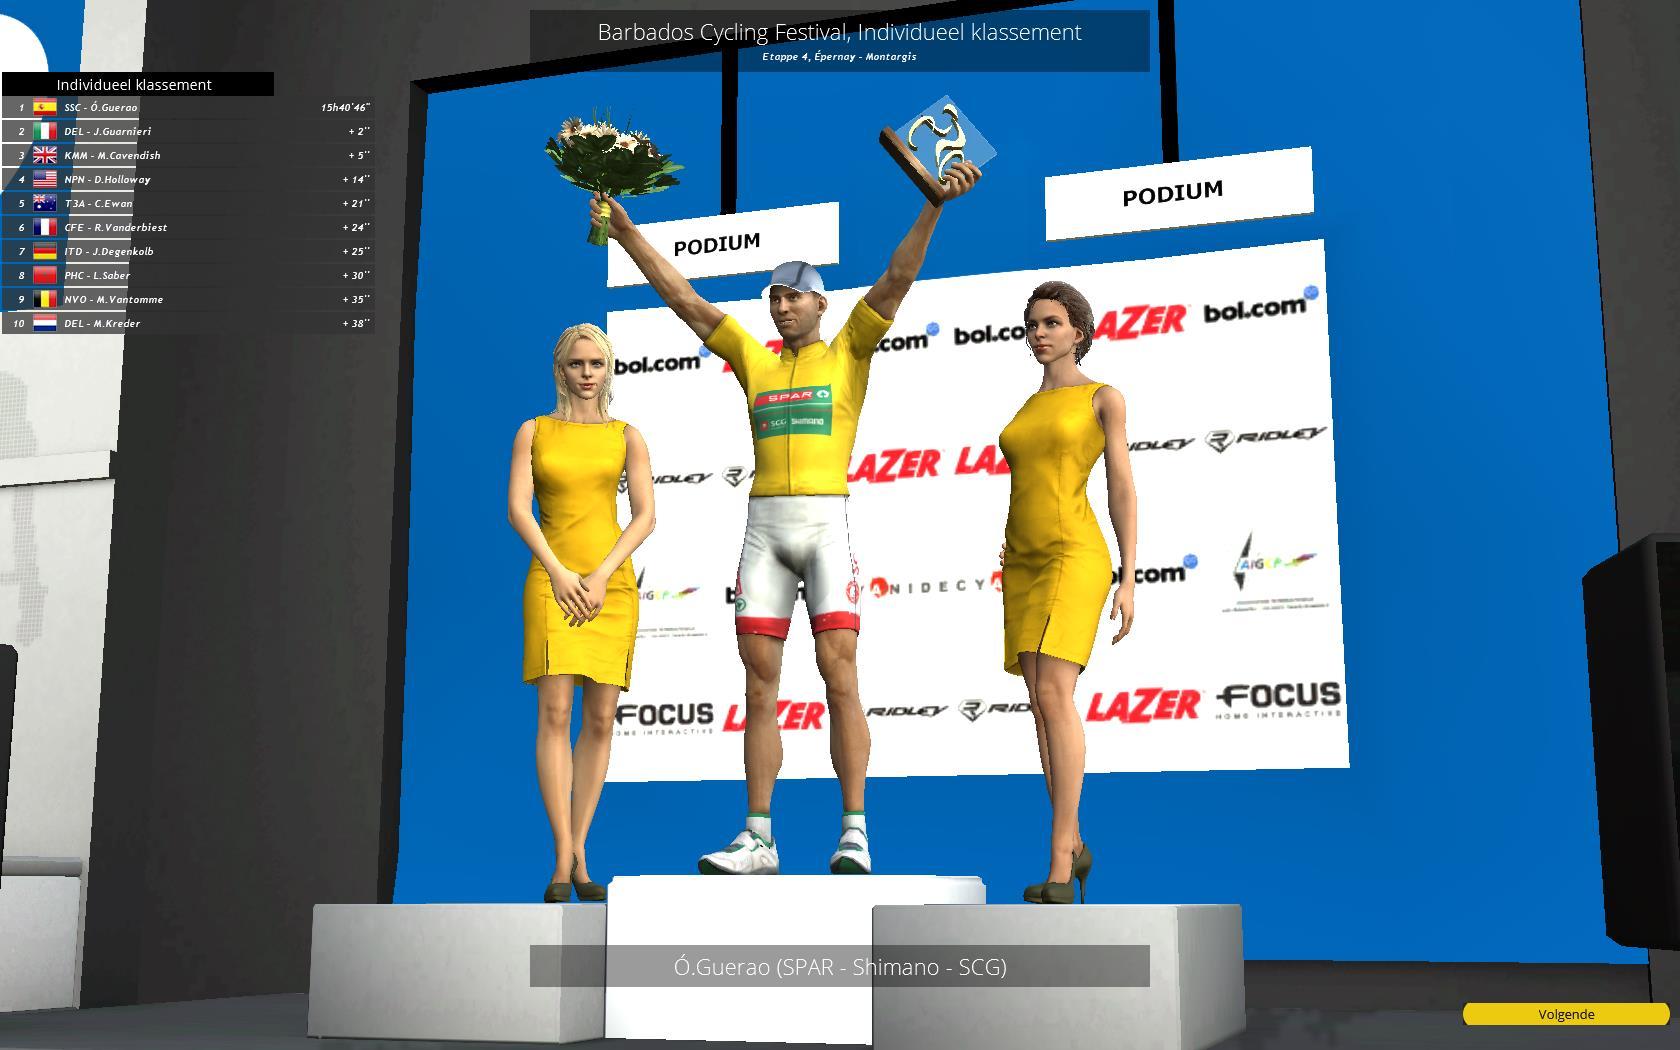 pcmdaily.com/images/mg/2018/Races/HC/Barbados/4/PCM0030.jpg